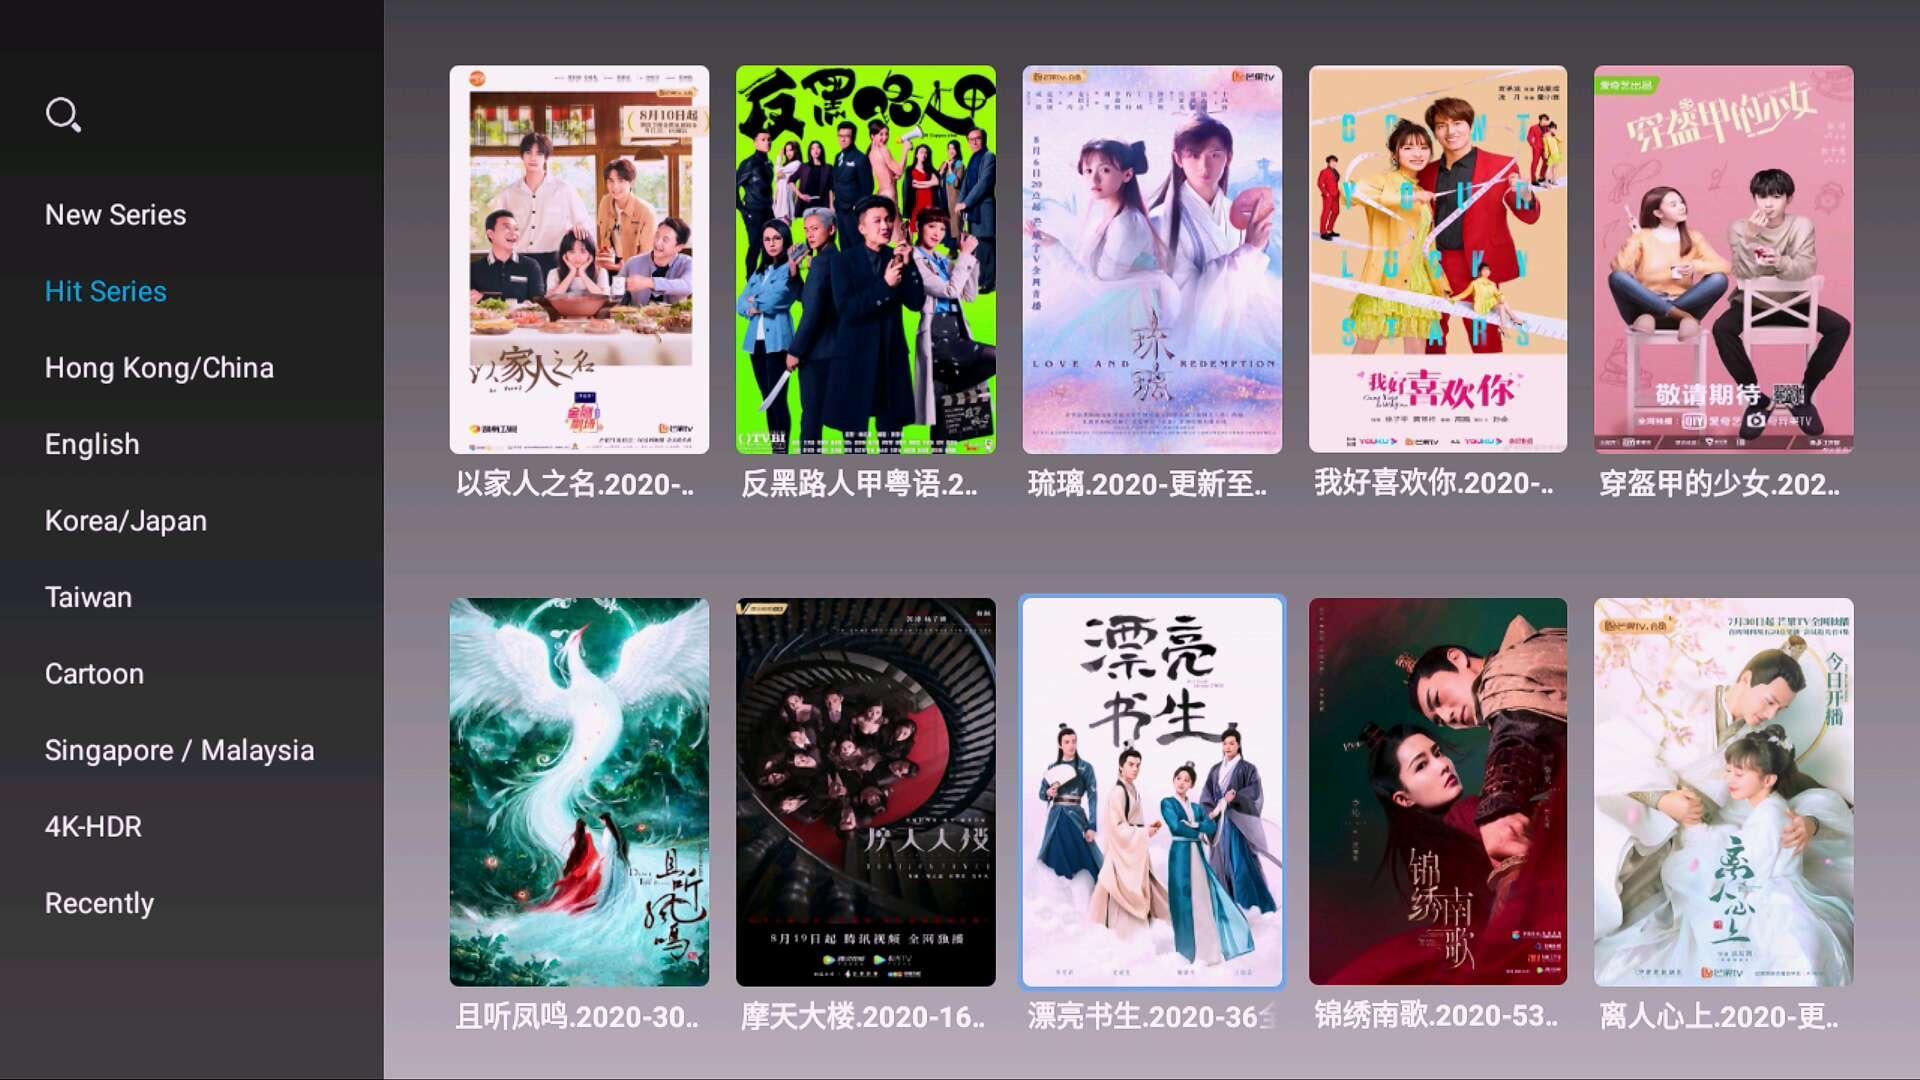 2020 latest Singapore Malaysia tv box iFibre Cloud all Starhub tv channels astro 18